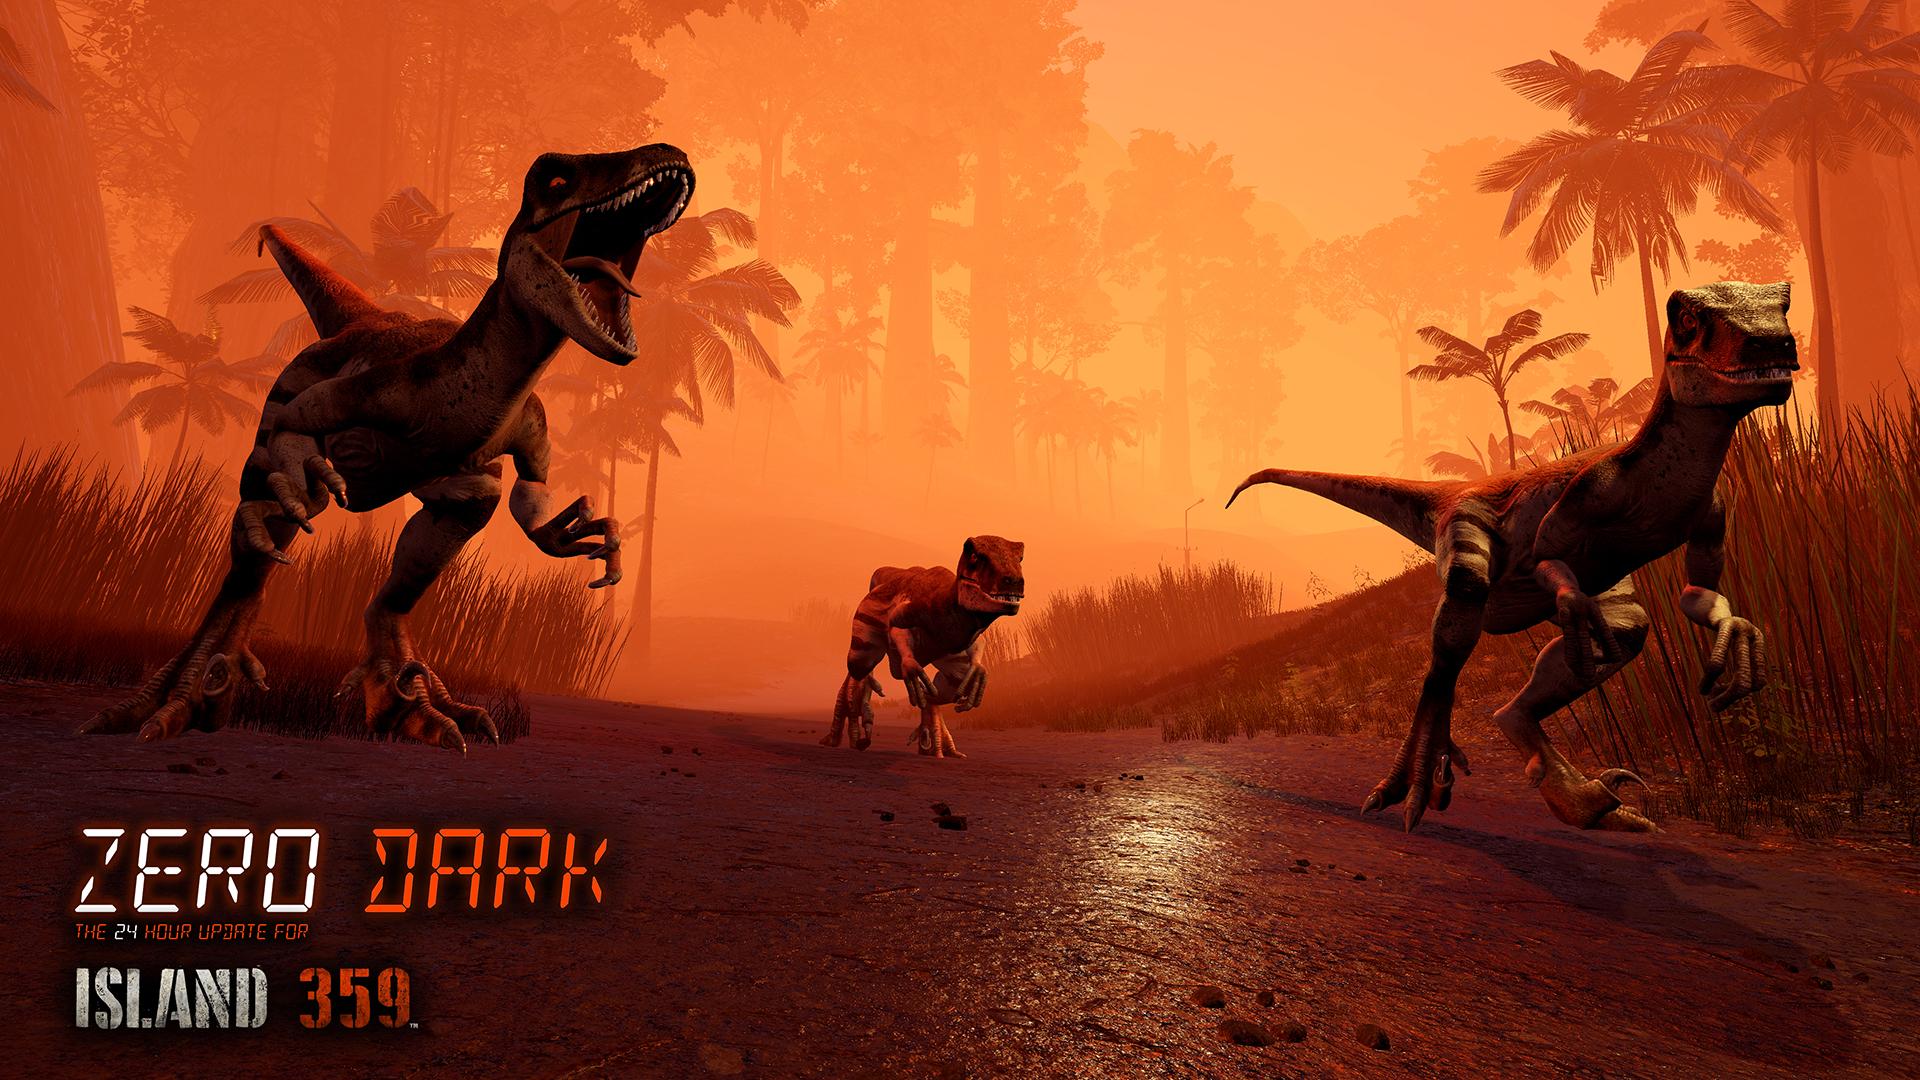 VRゲーム,Island 359™,イメージ